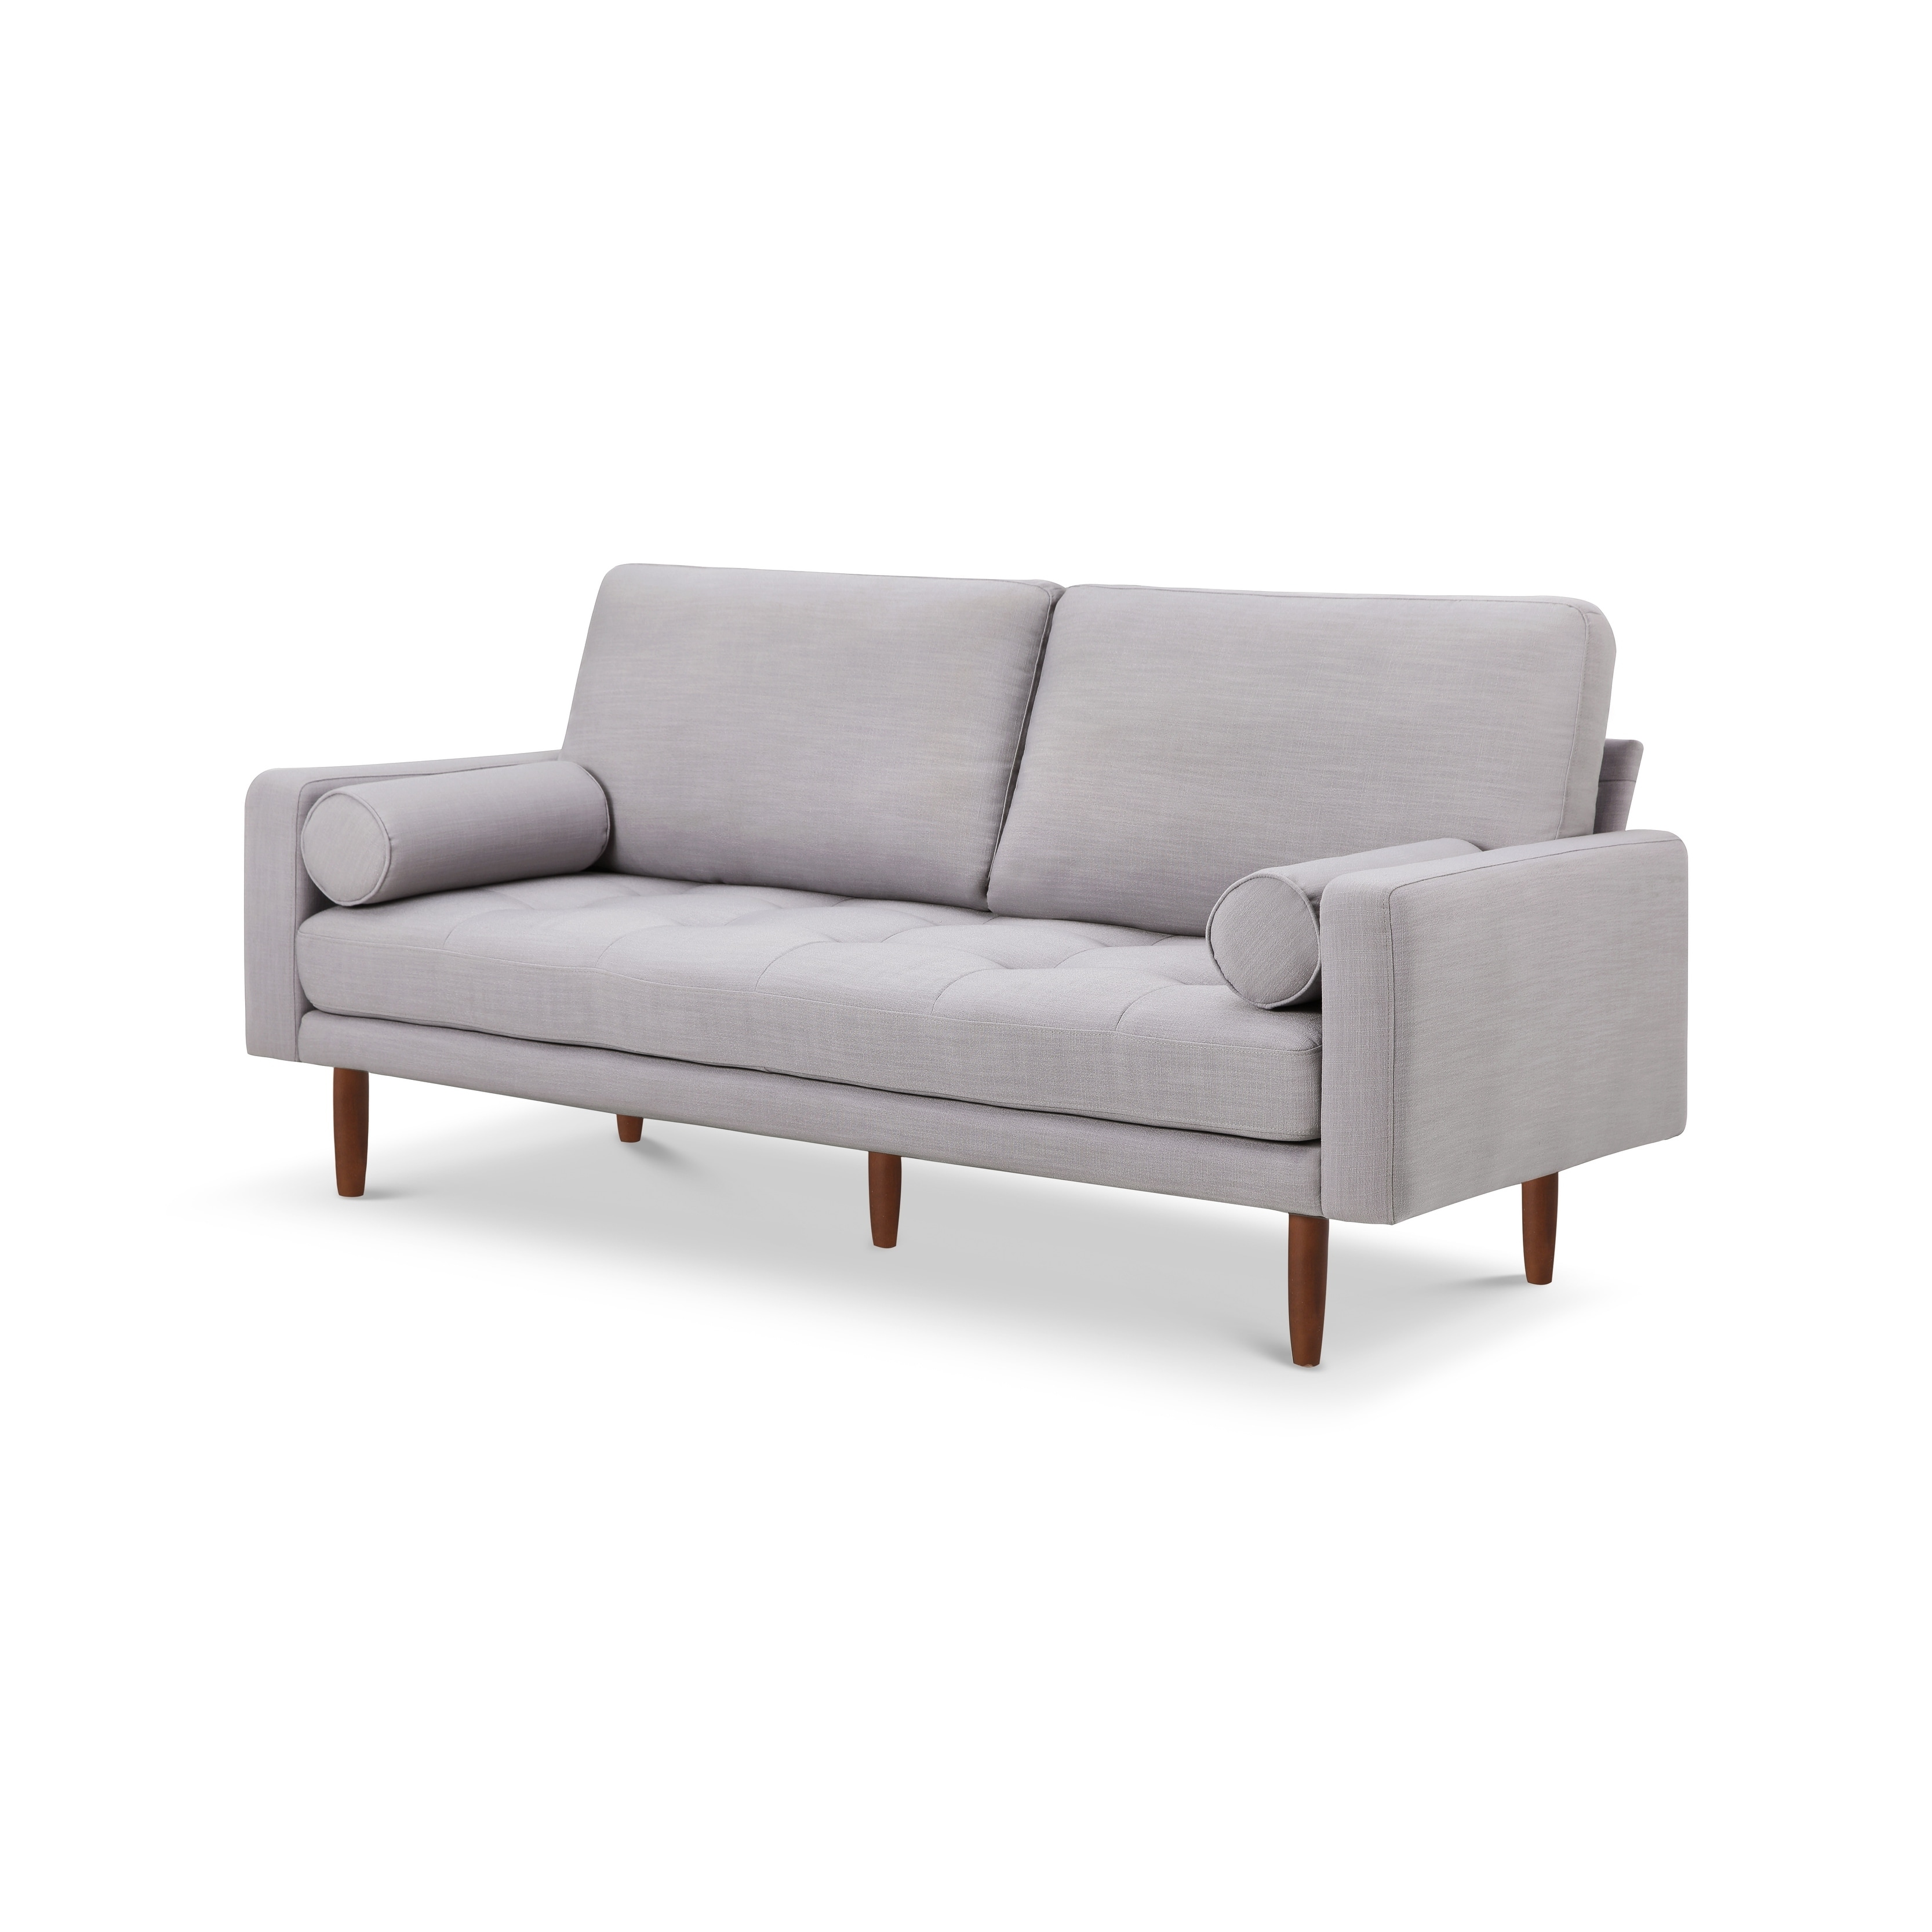 brooklyn 3 seater sofa freedom barletta sofas sectionals living natuzzi